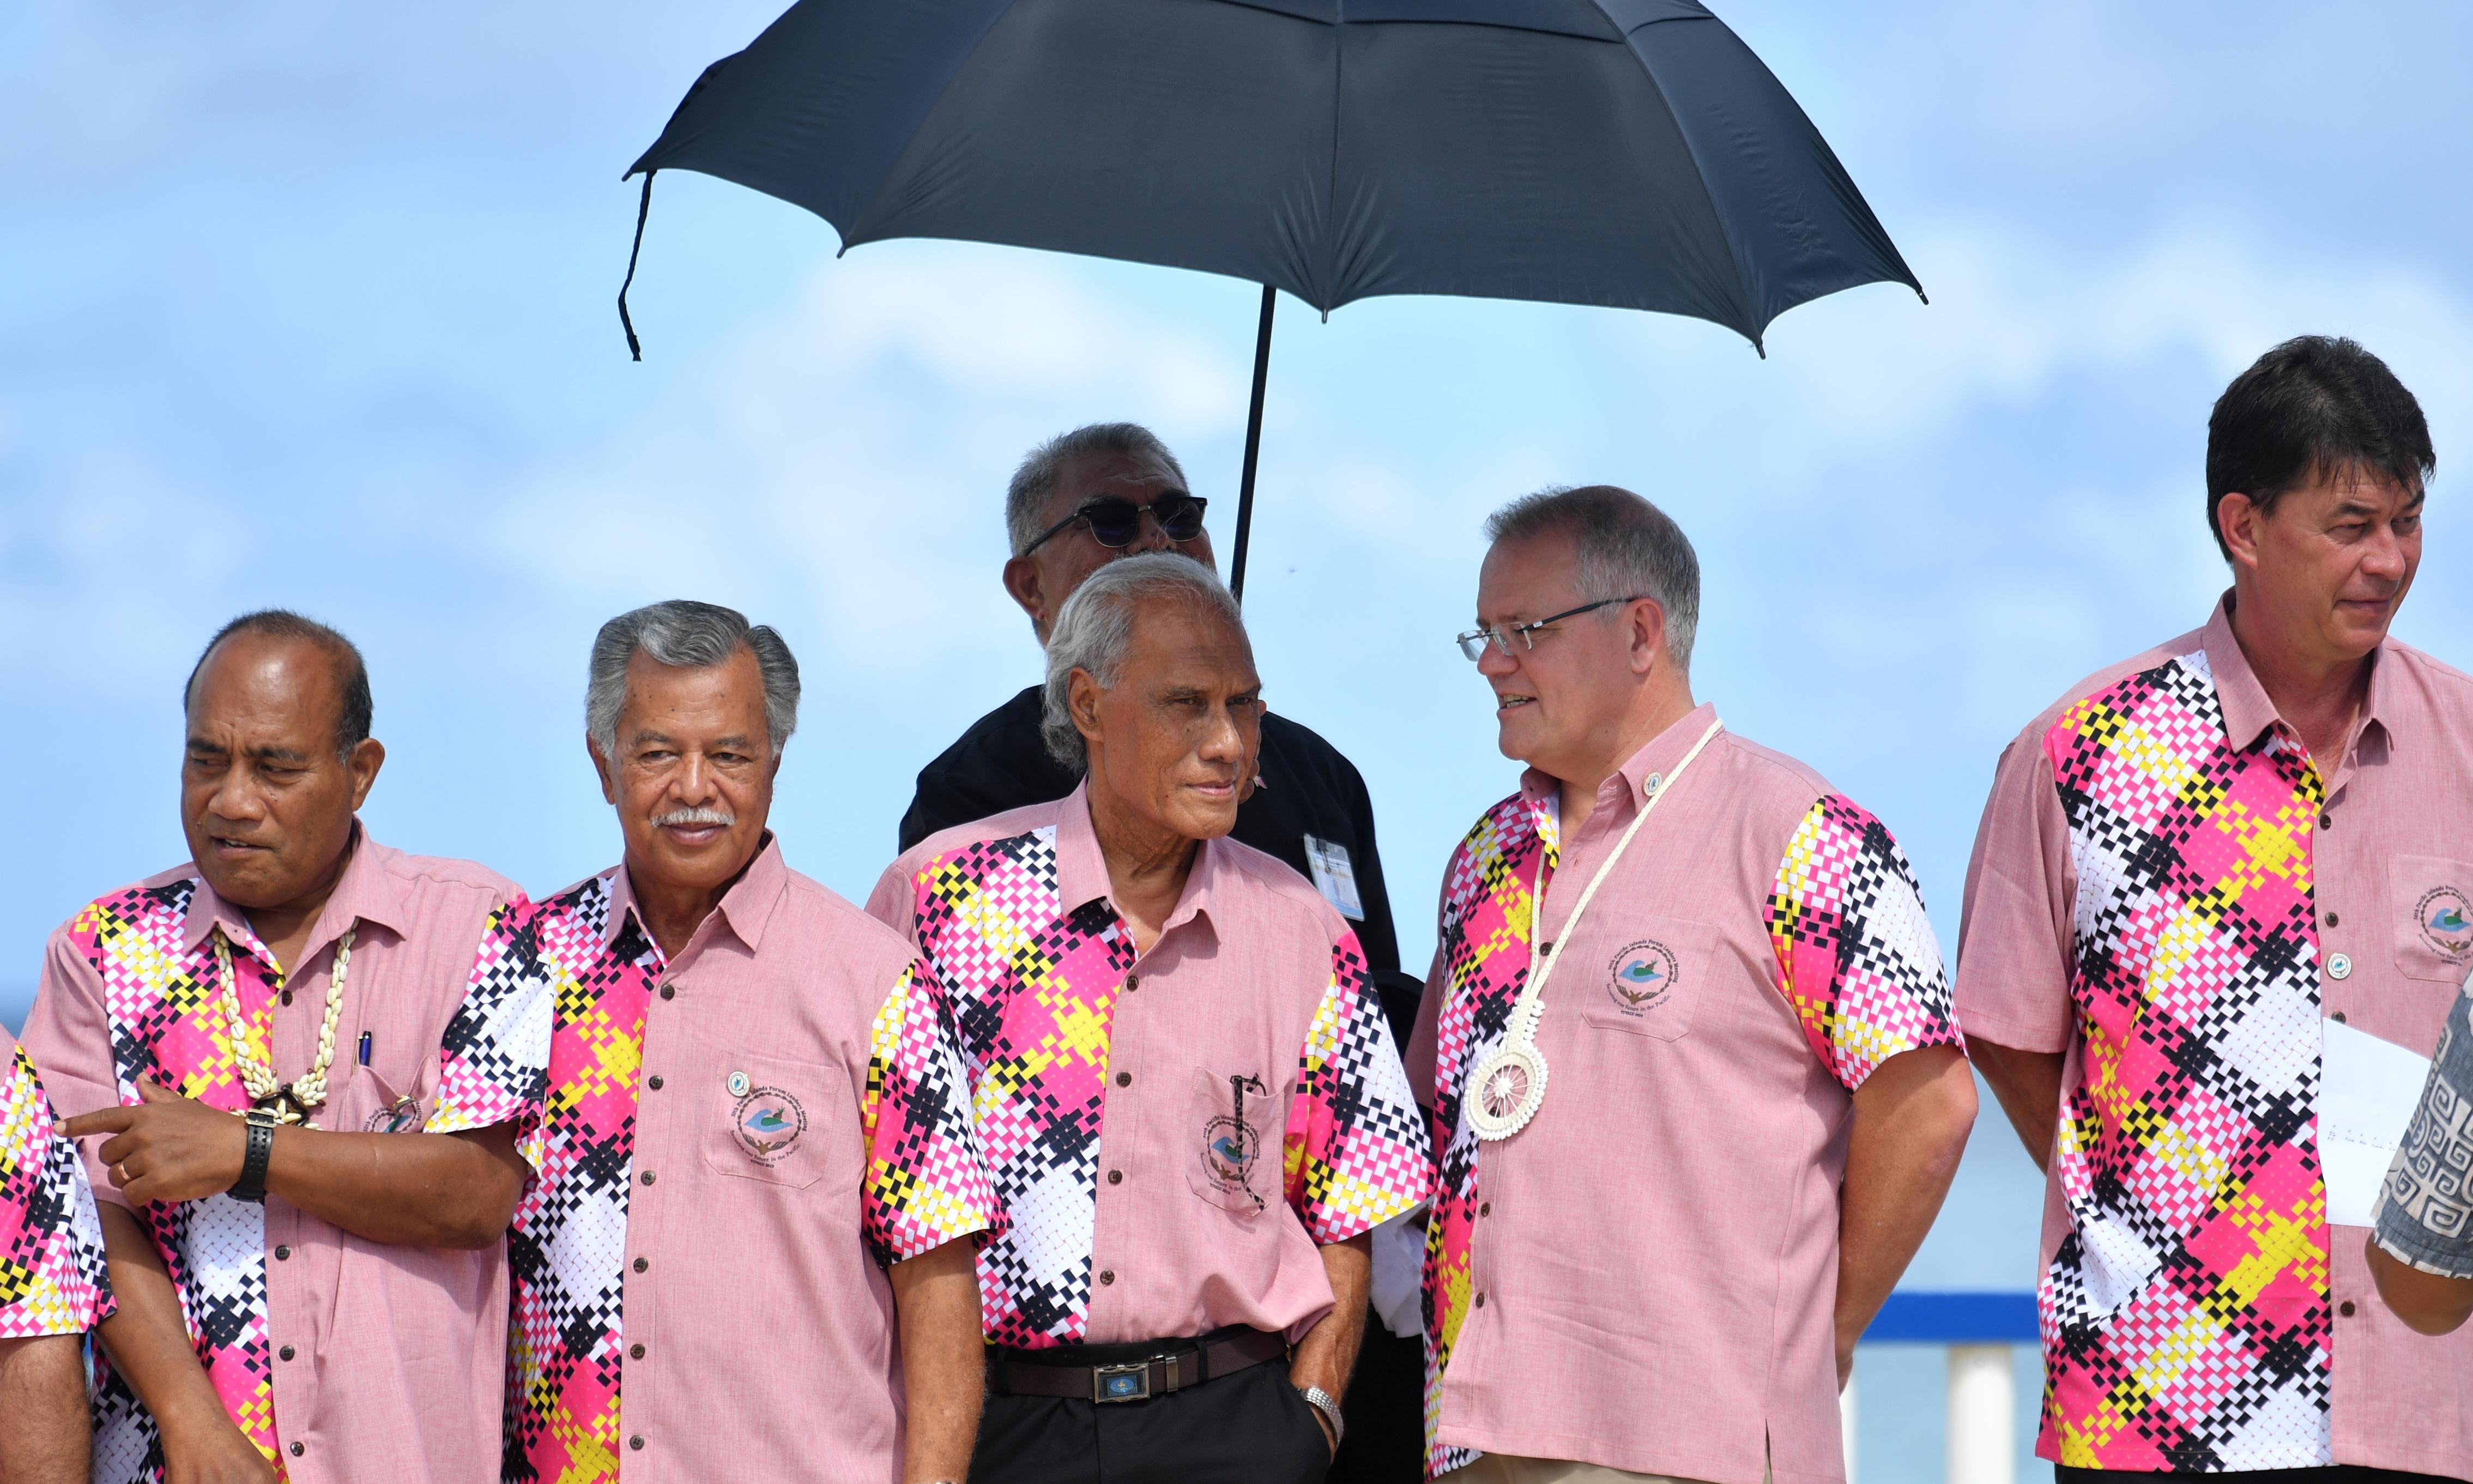 Australia waters down Pacific Islands plea on climate crisis